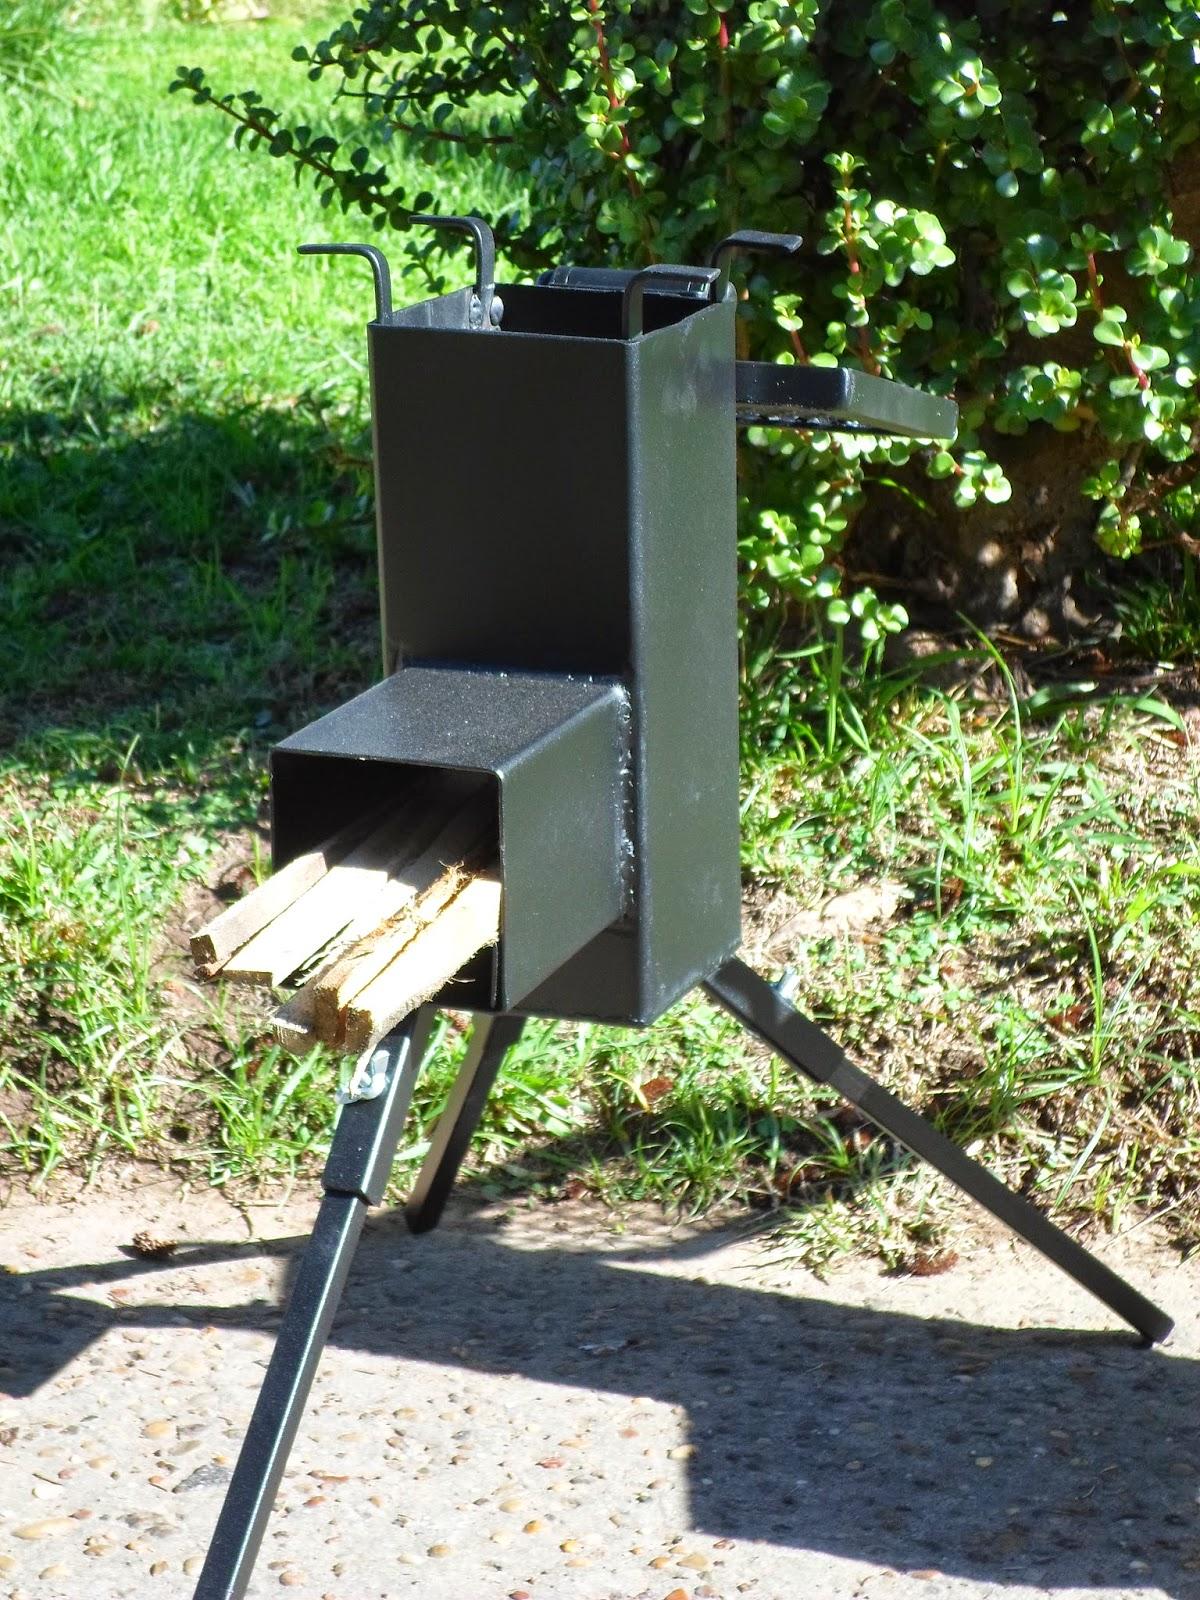 Asadores parrillas jama for Antorchas para jardin combustible